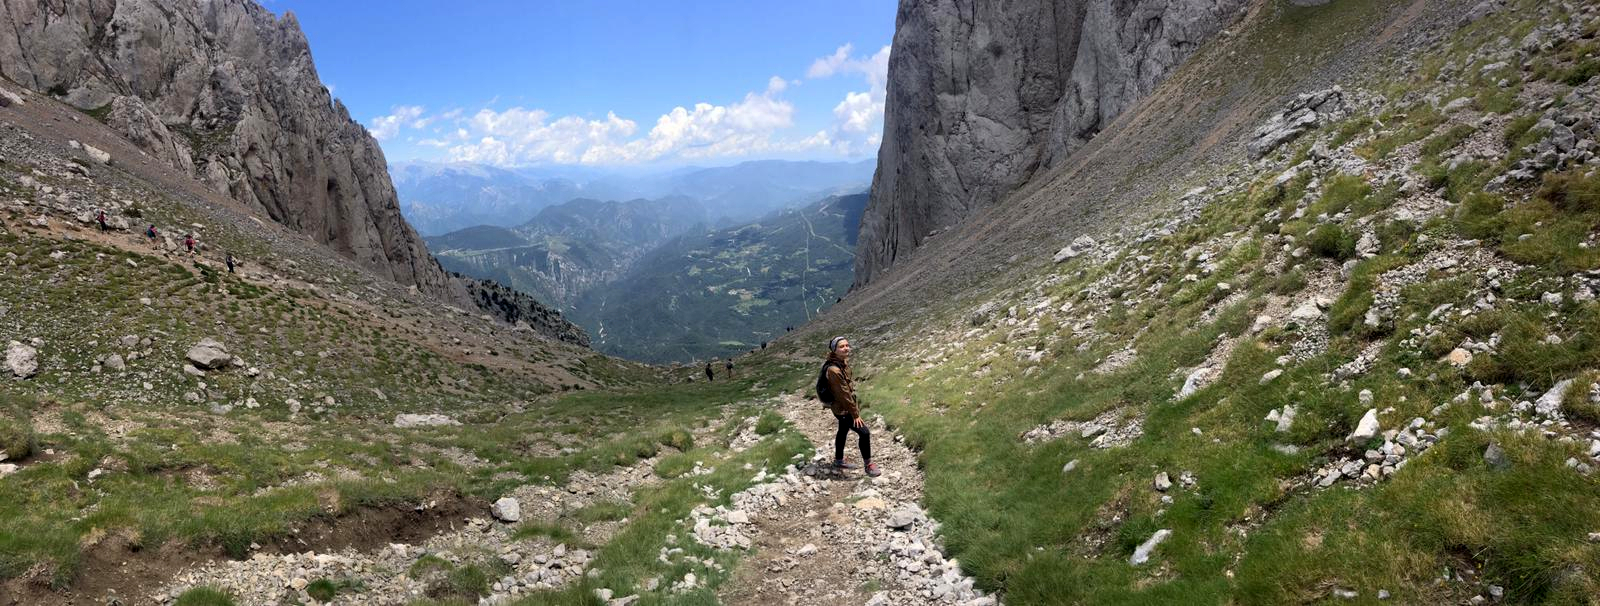 Wandern Pedreforca